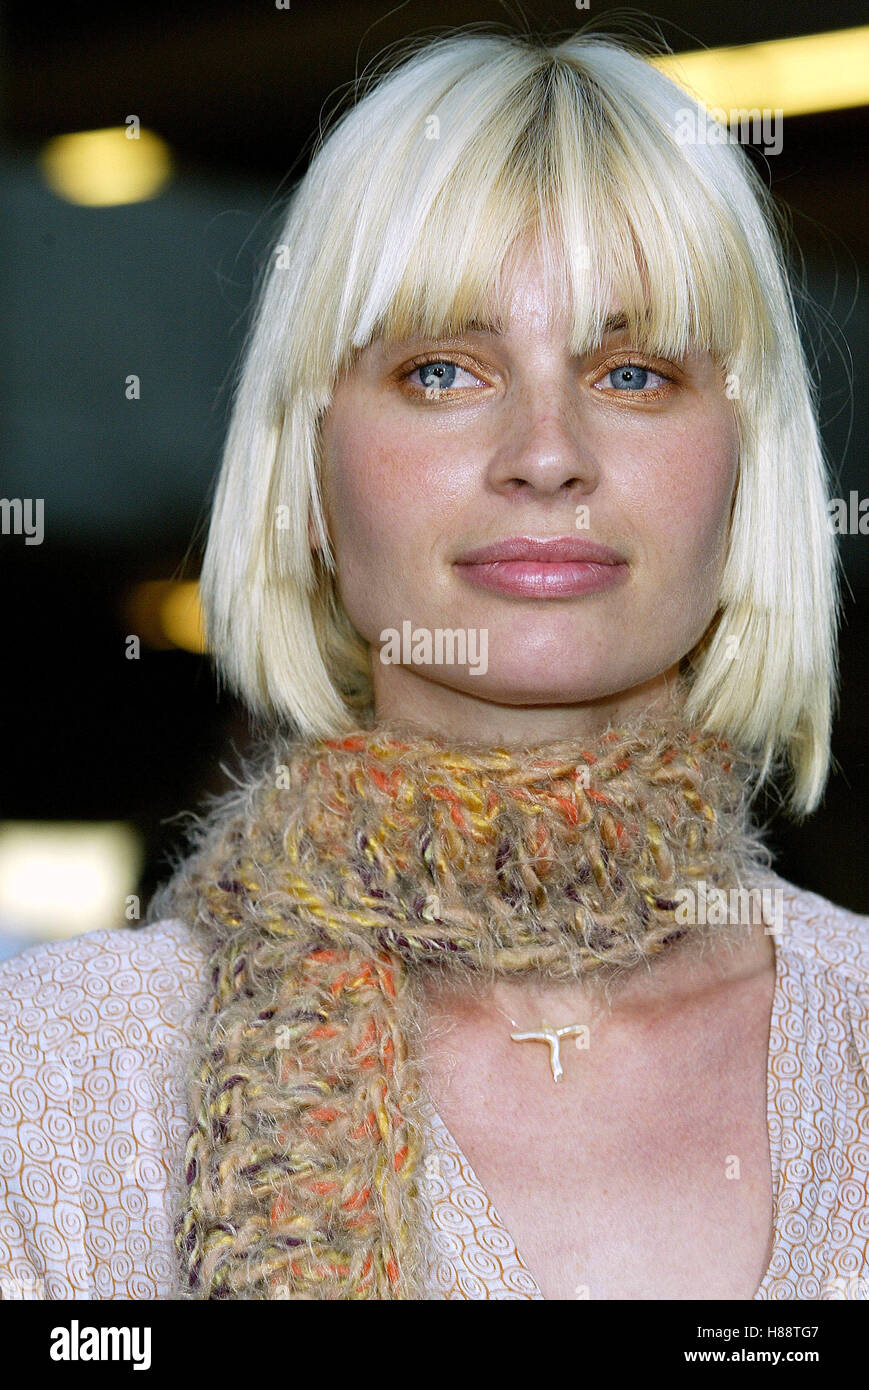 JOY DURHAM TREIZE PREMIERE FILM CINÉMA ARCLIGHT HOLLYWOOD LOS ANGELES USA 12 Août 2003 Photo Stock